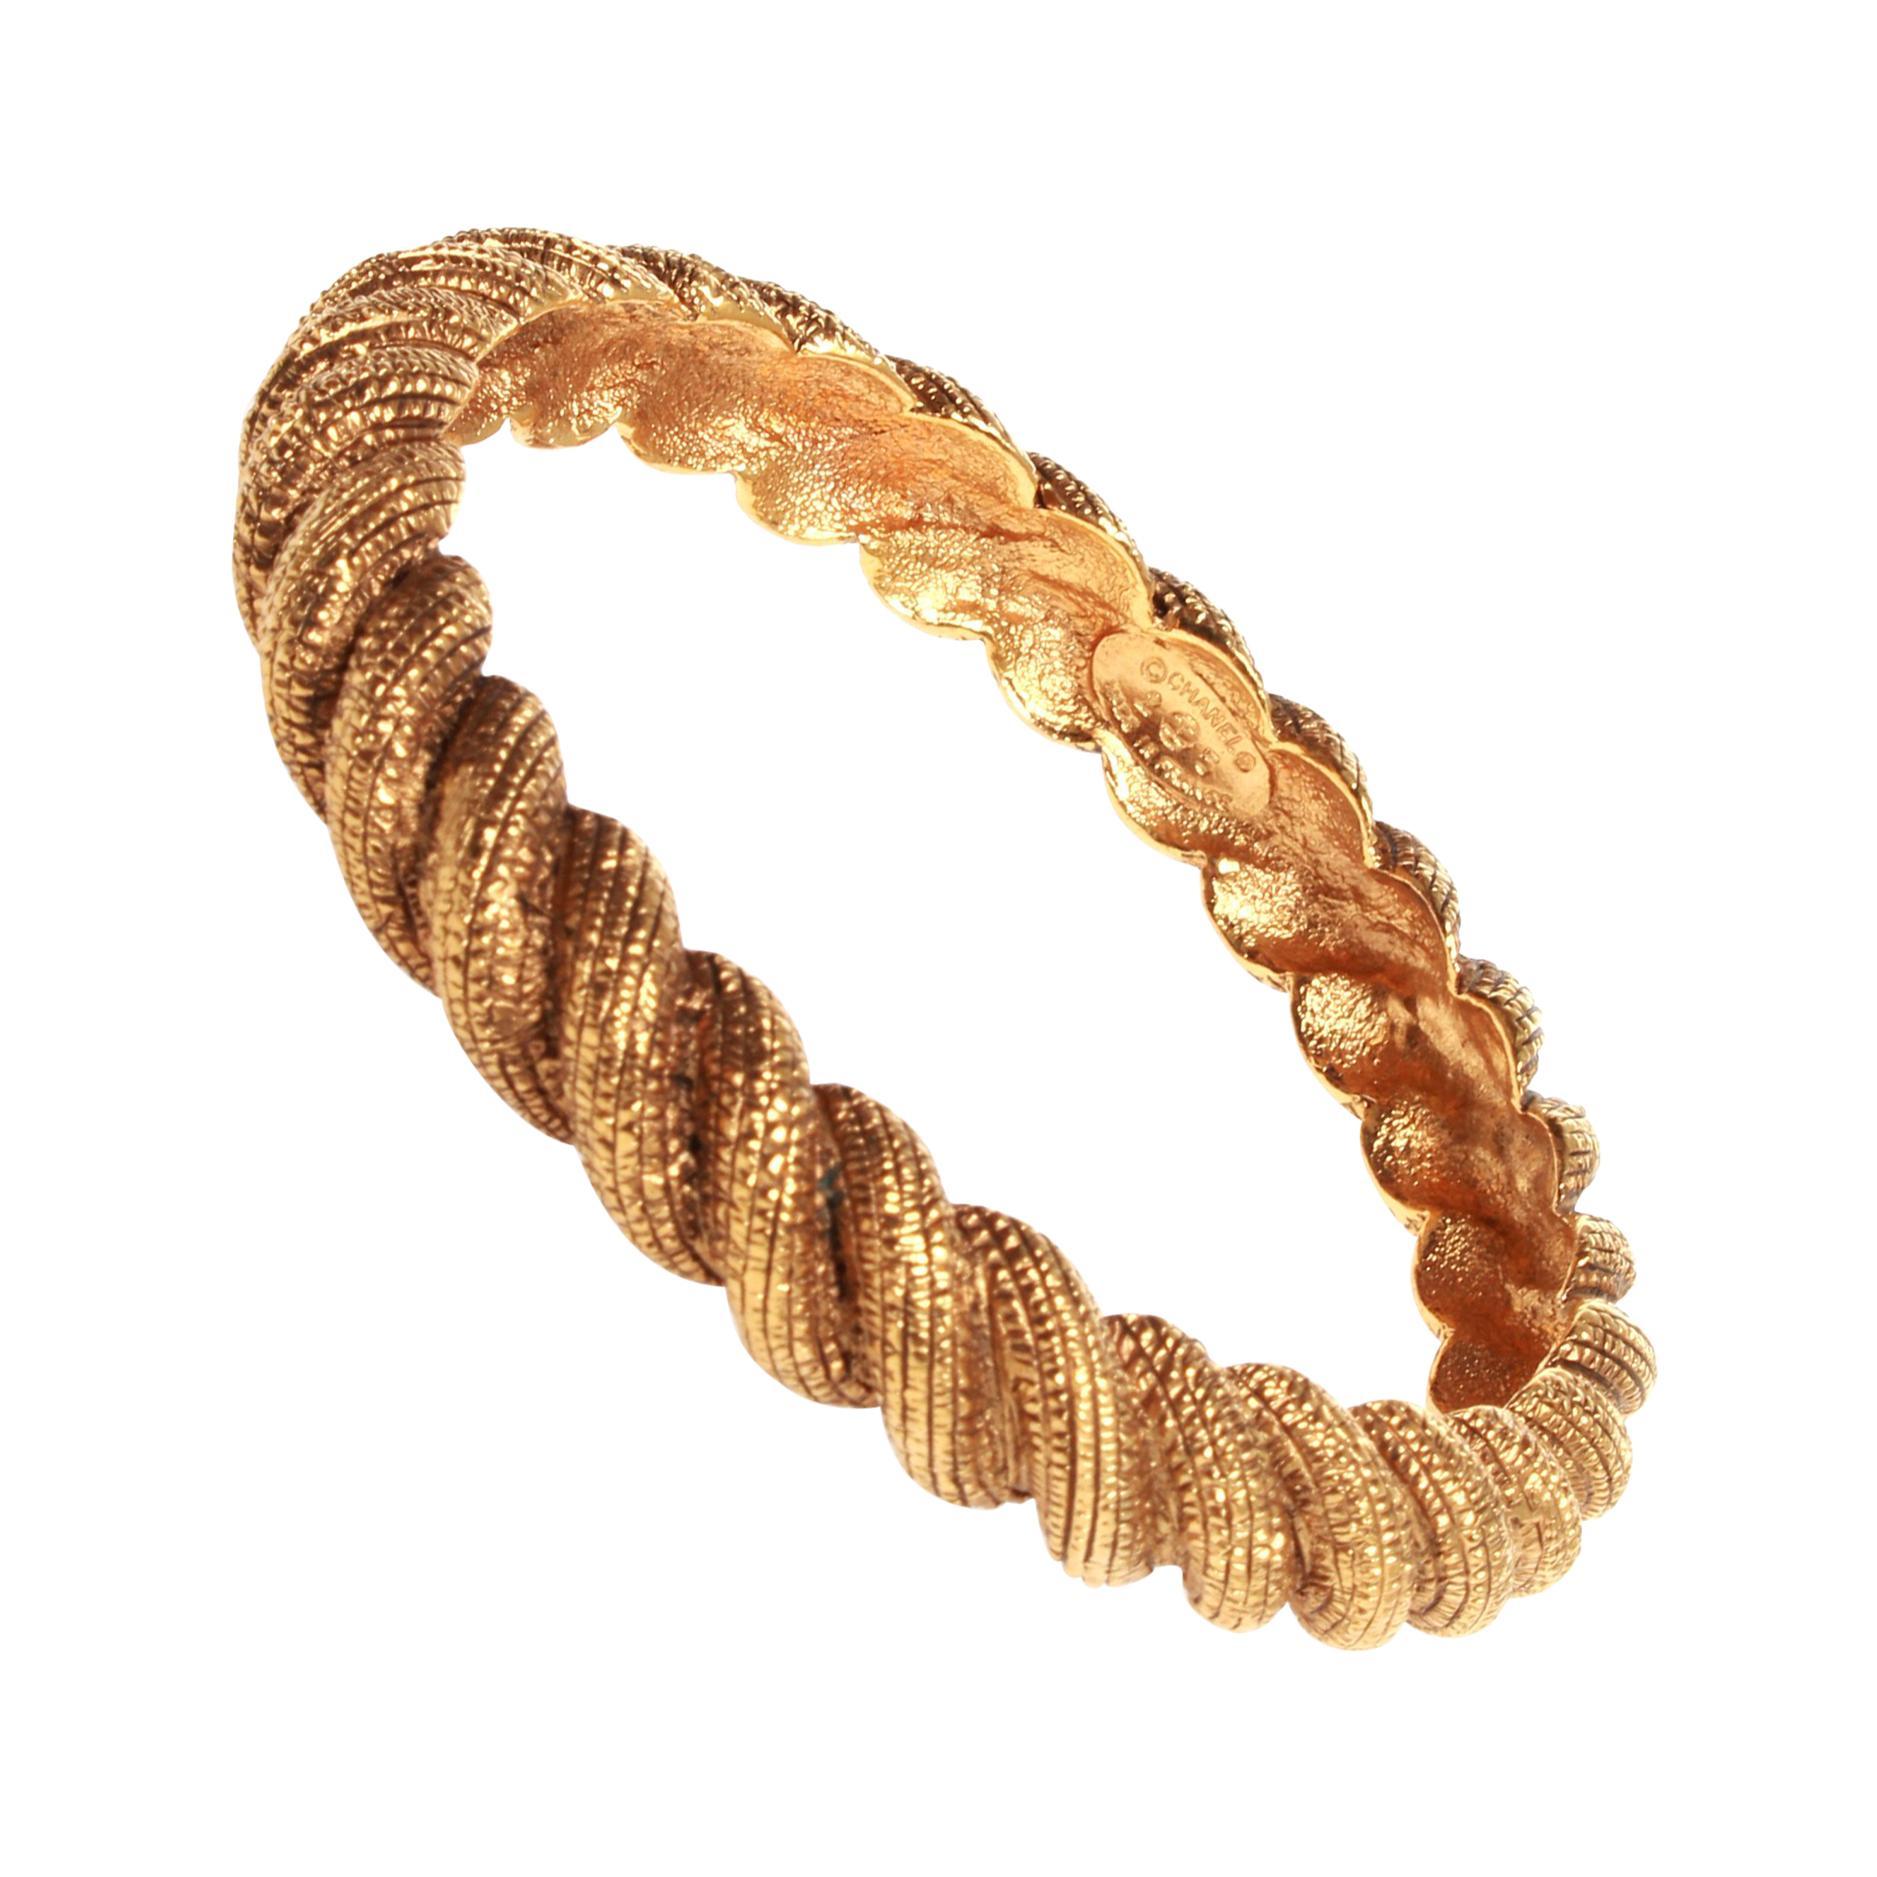 NEW $720 DOLCE /& GABBANA Bracelet Gold Brass Red Floral Roses Bangle One Size